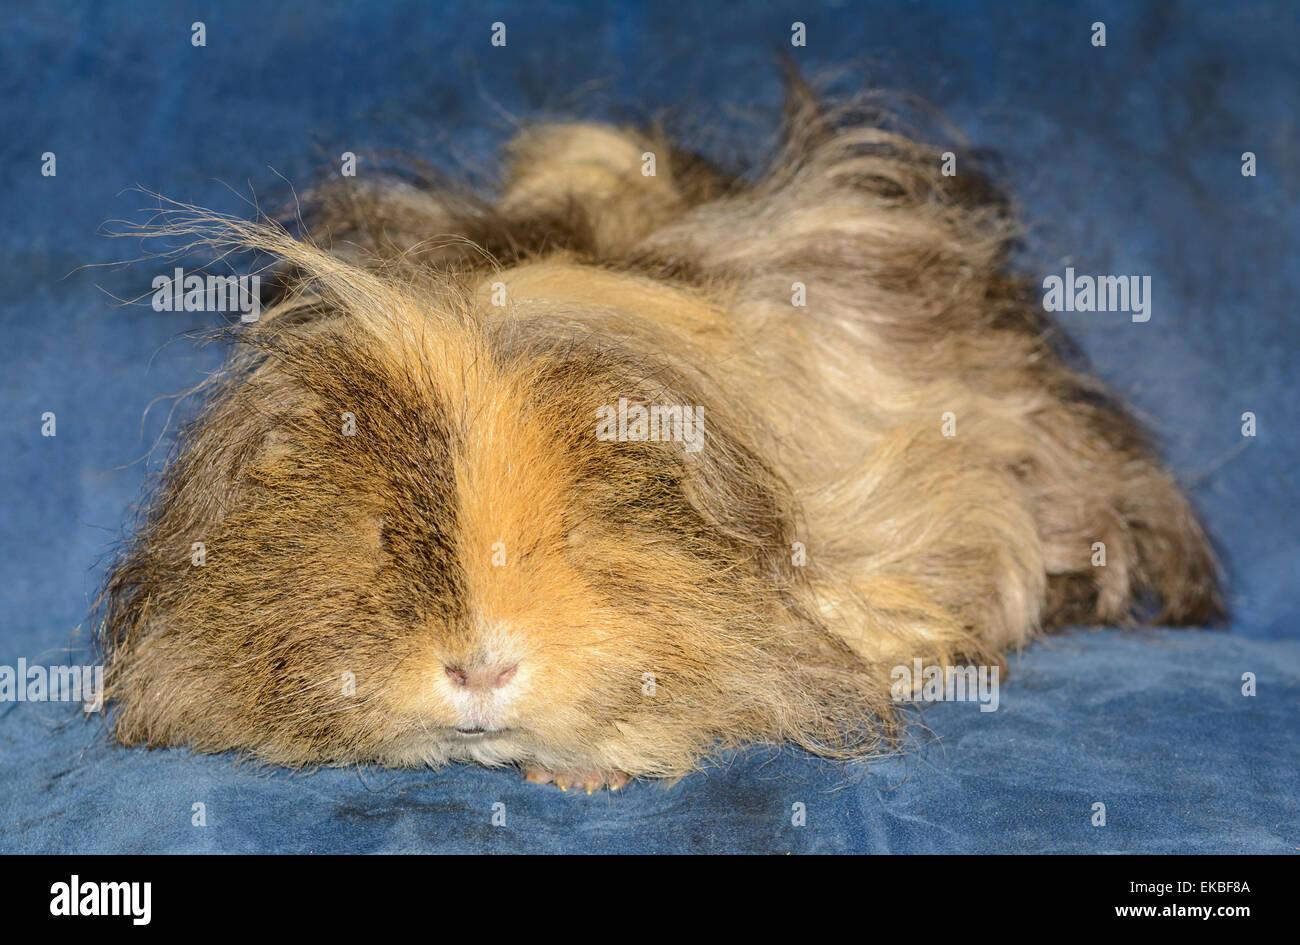 Fluffy male guinea pig sleeping. - Stock Image